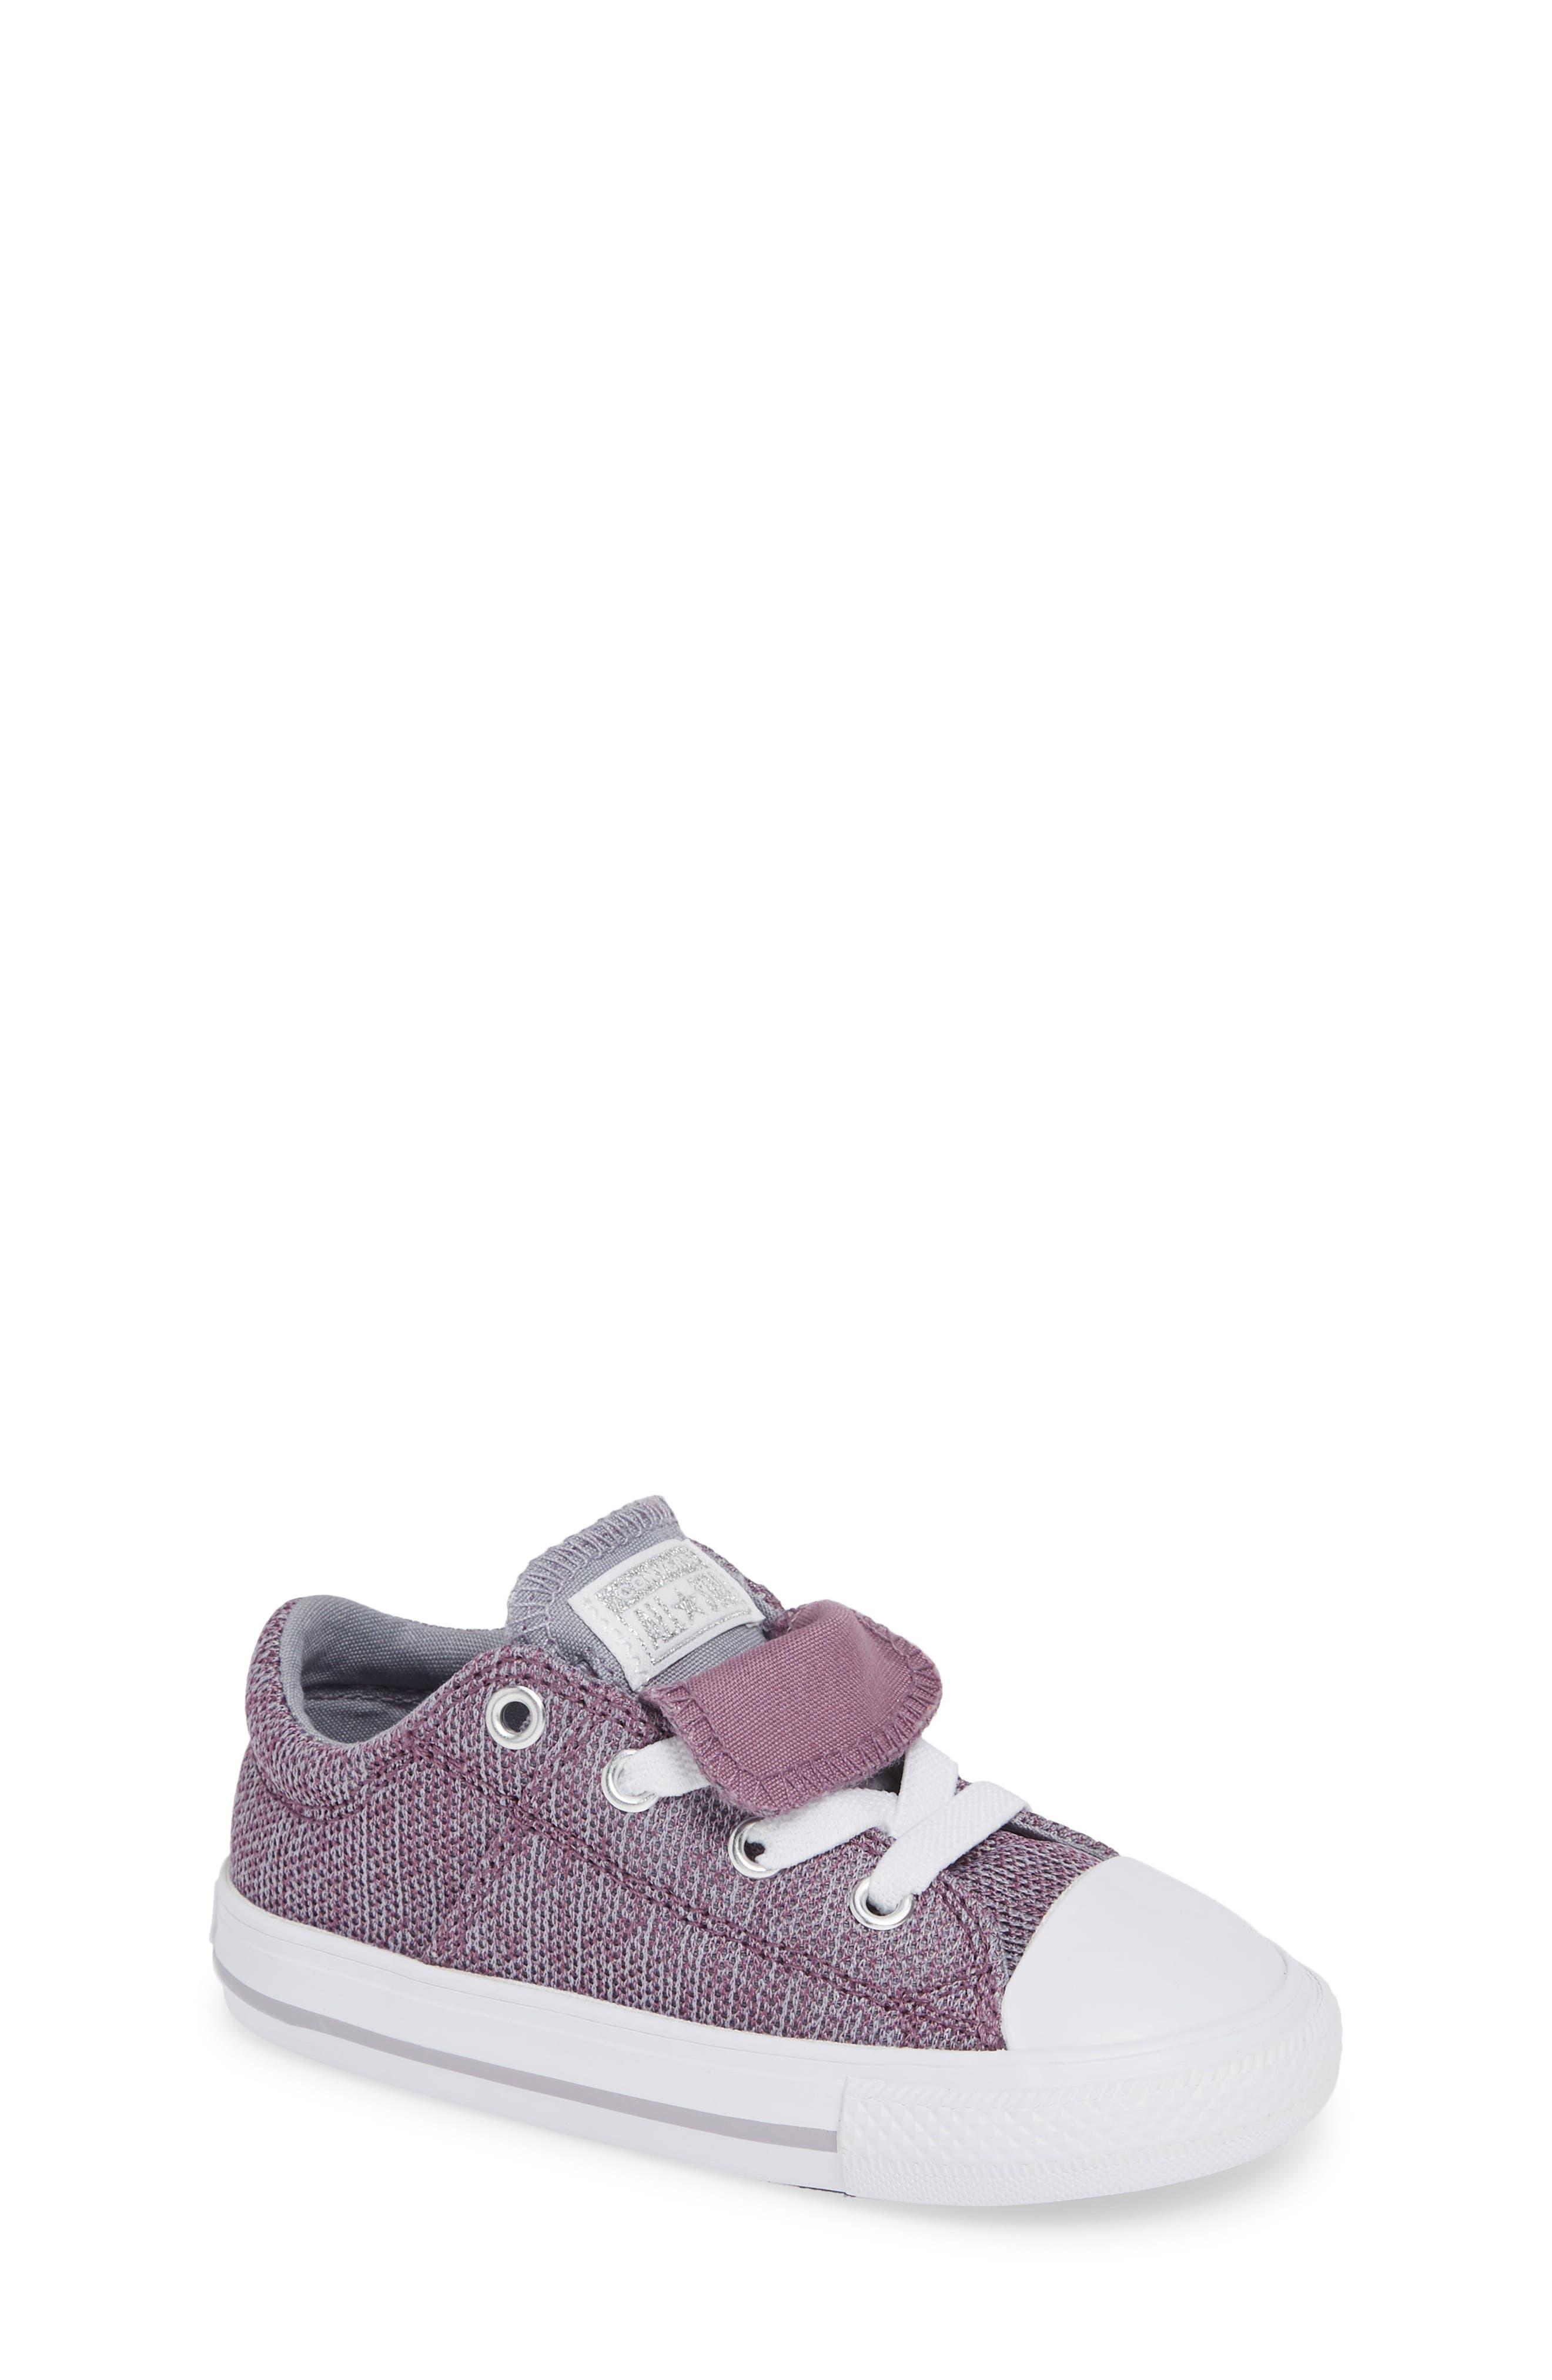 e20b9bf8202 Big Girls  Converse Shoes (Sizes 3.5-7)